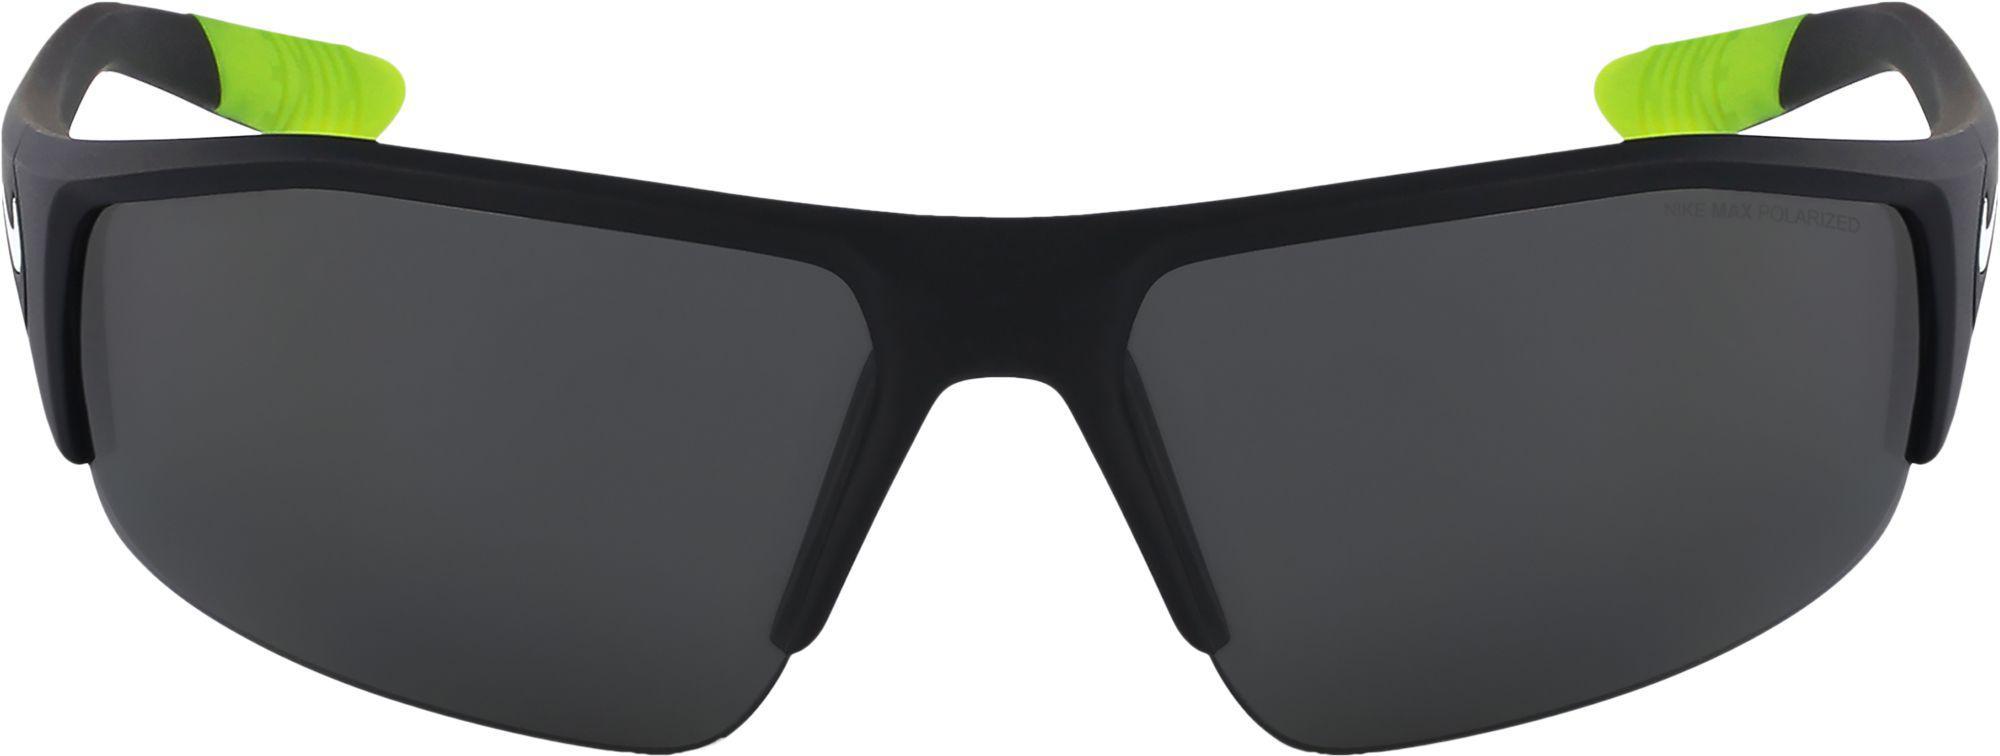 d1cadd4ffce1 Nike - Gray Skylon Ace Xv Polarized Sunglasses for Men - Lyst. View  fullscreen